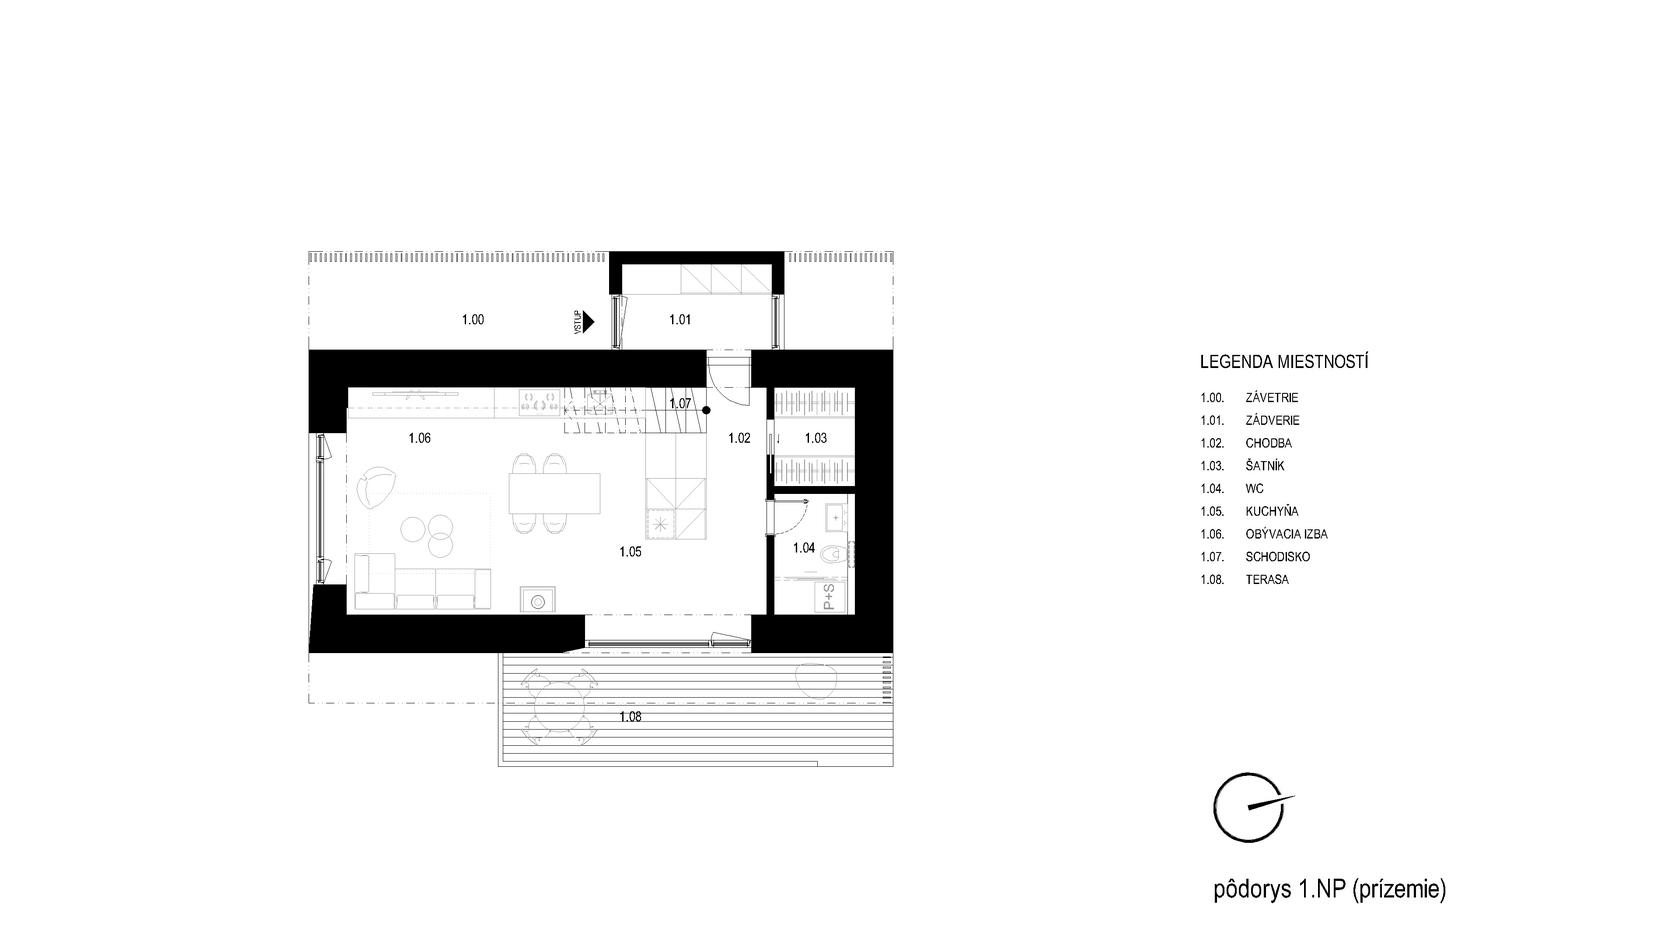 rodinny-dom-rekonstrukcia-horne-prsany-podorys-prizemie-od-architekta-moderny-dizajn-archilab